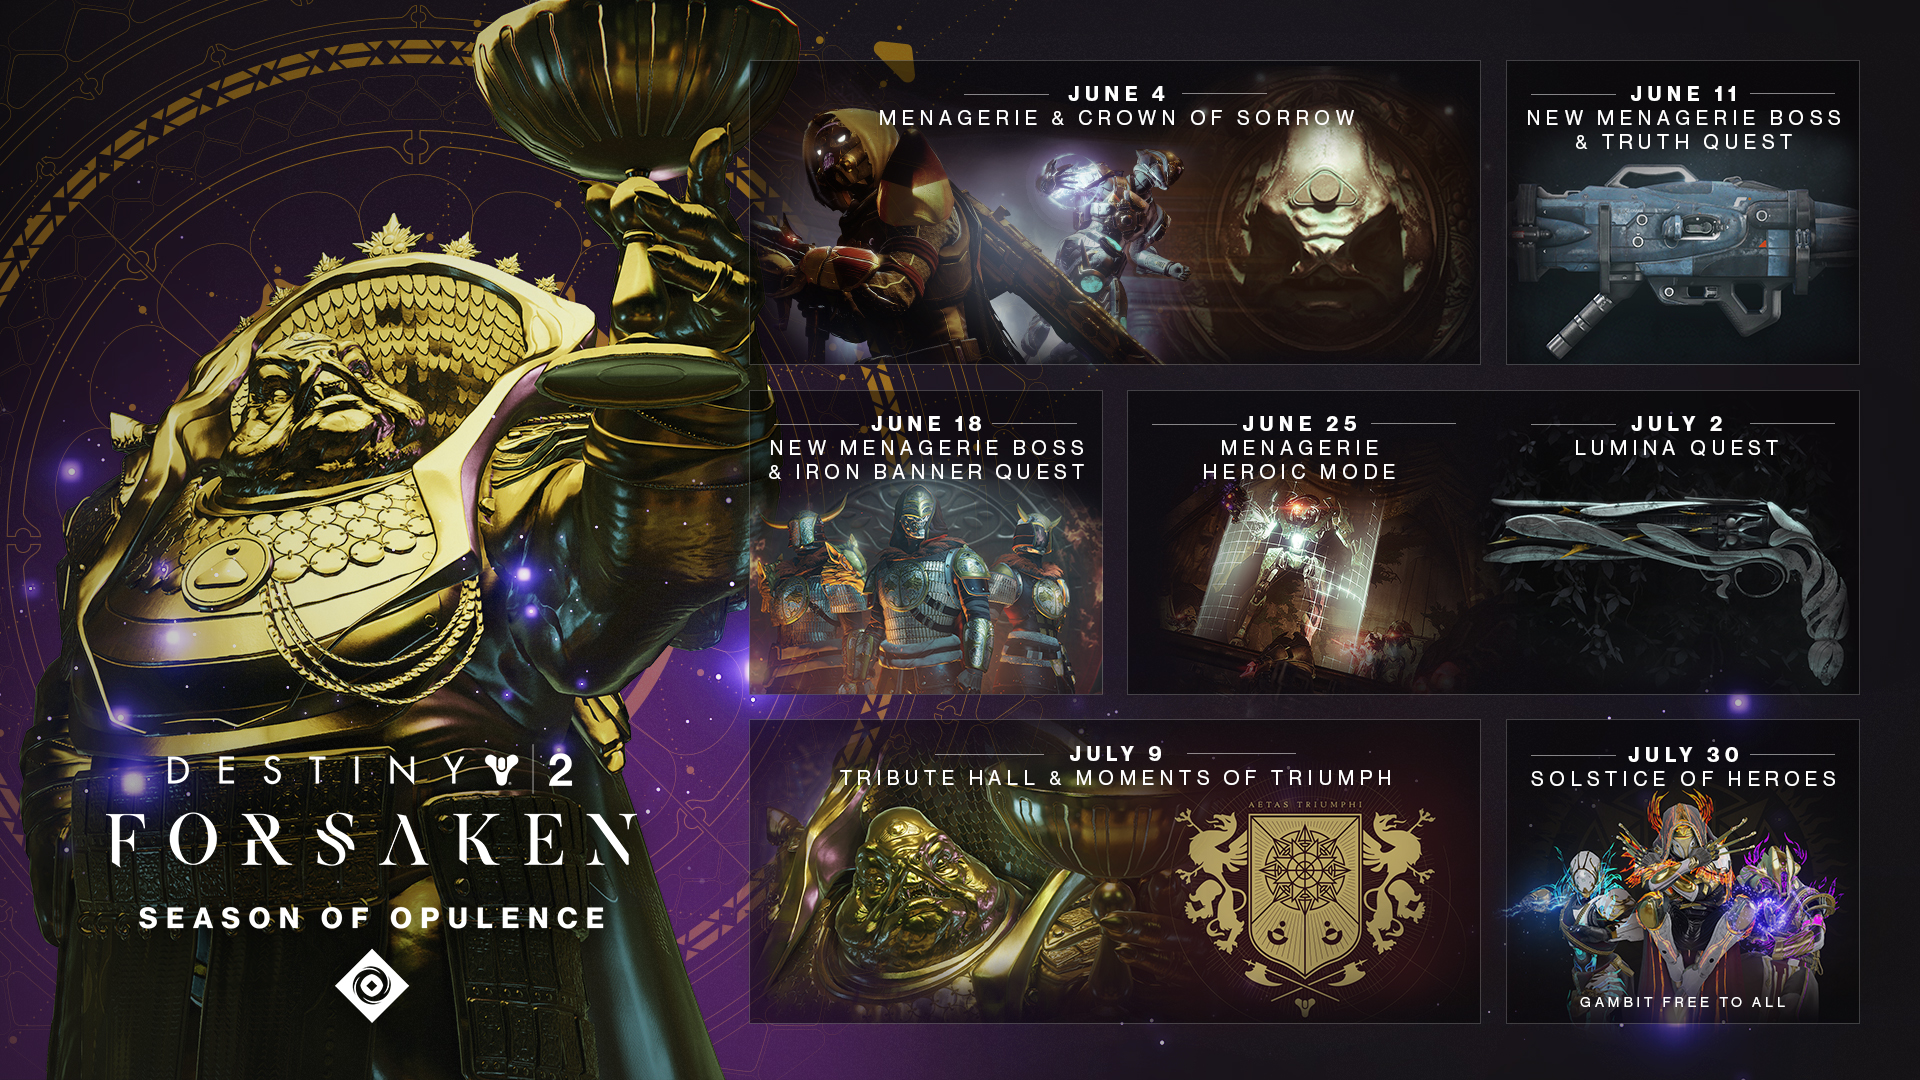 Destiny 2 Season of Opulence features